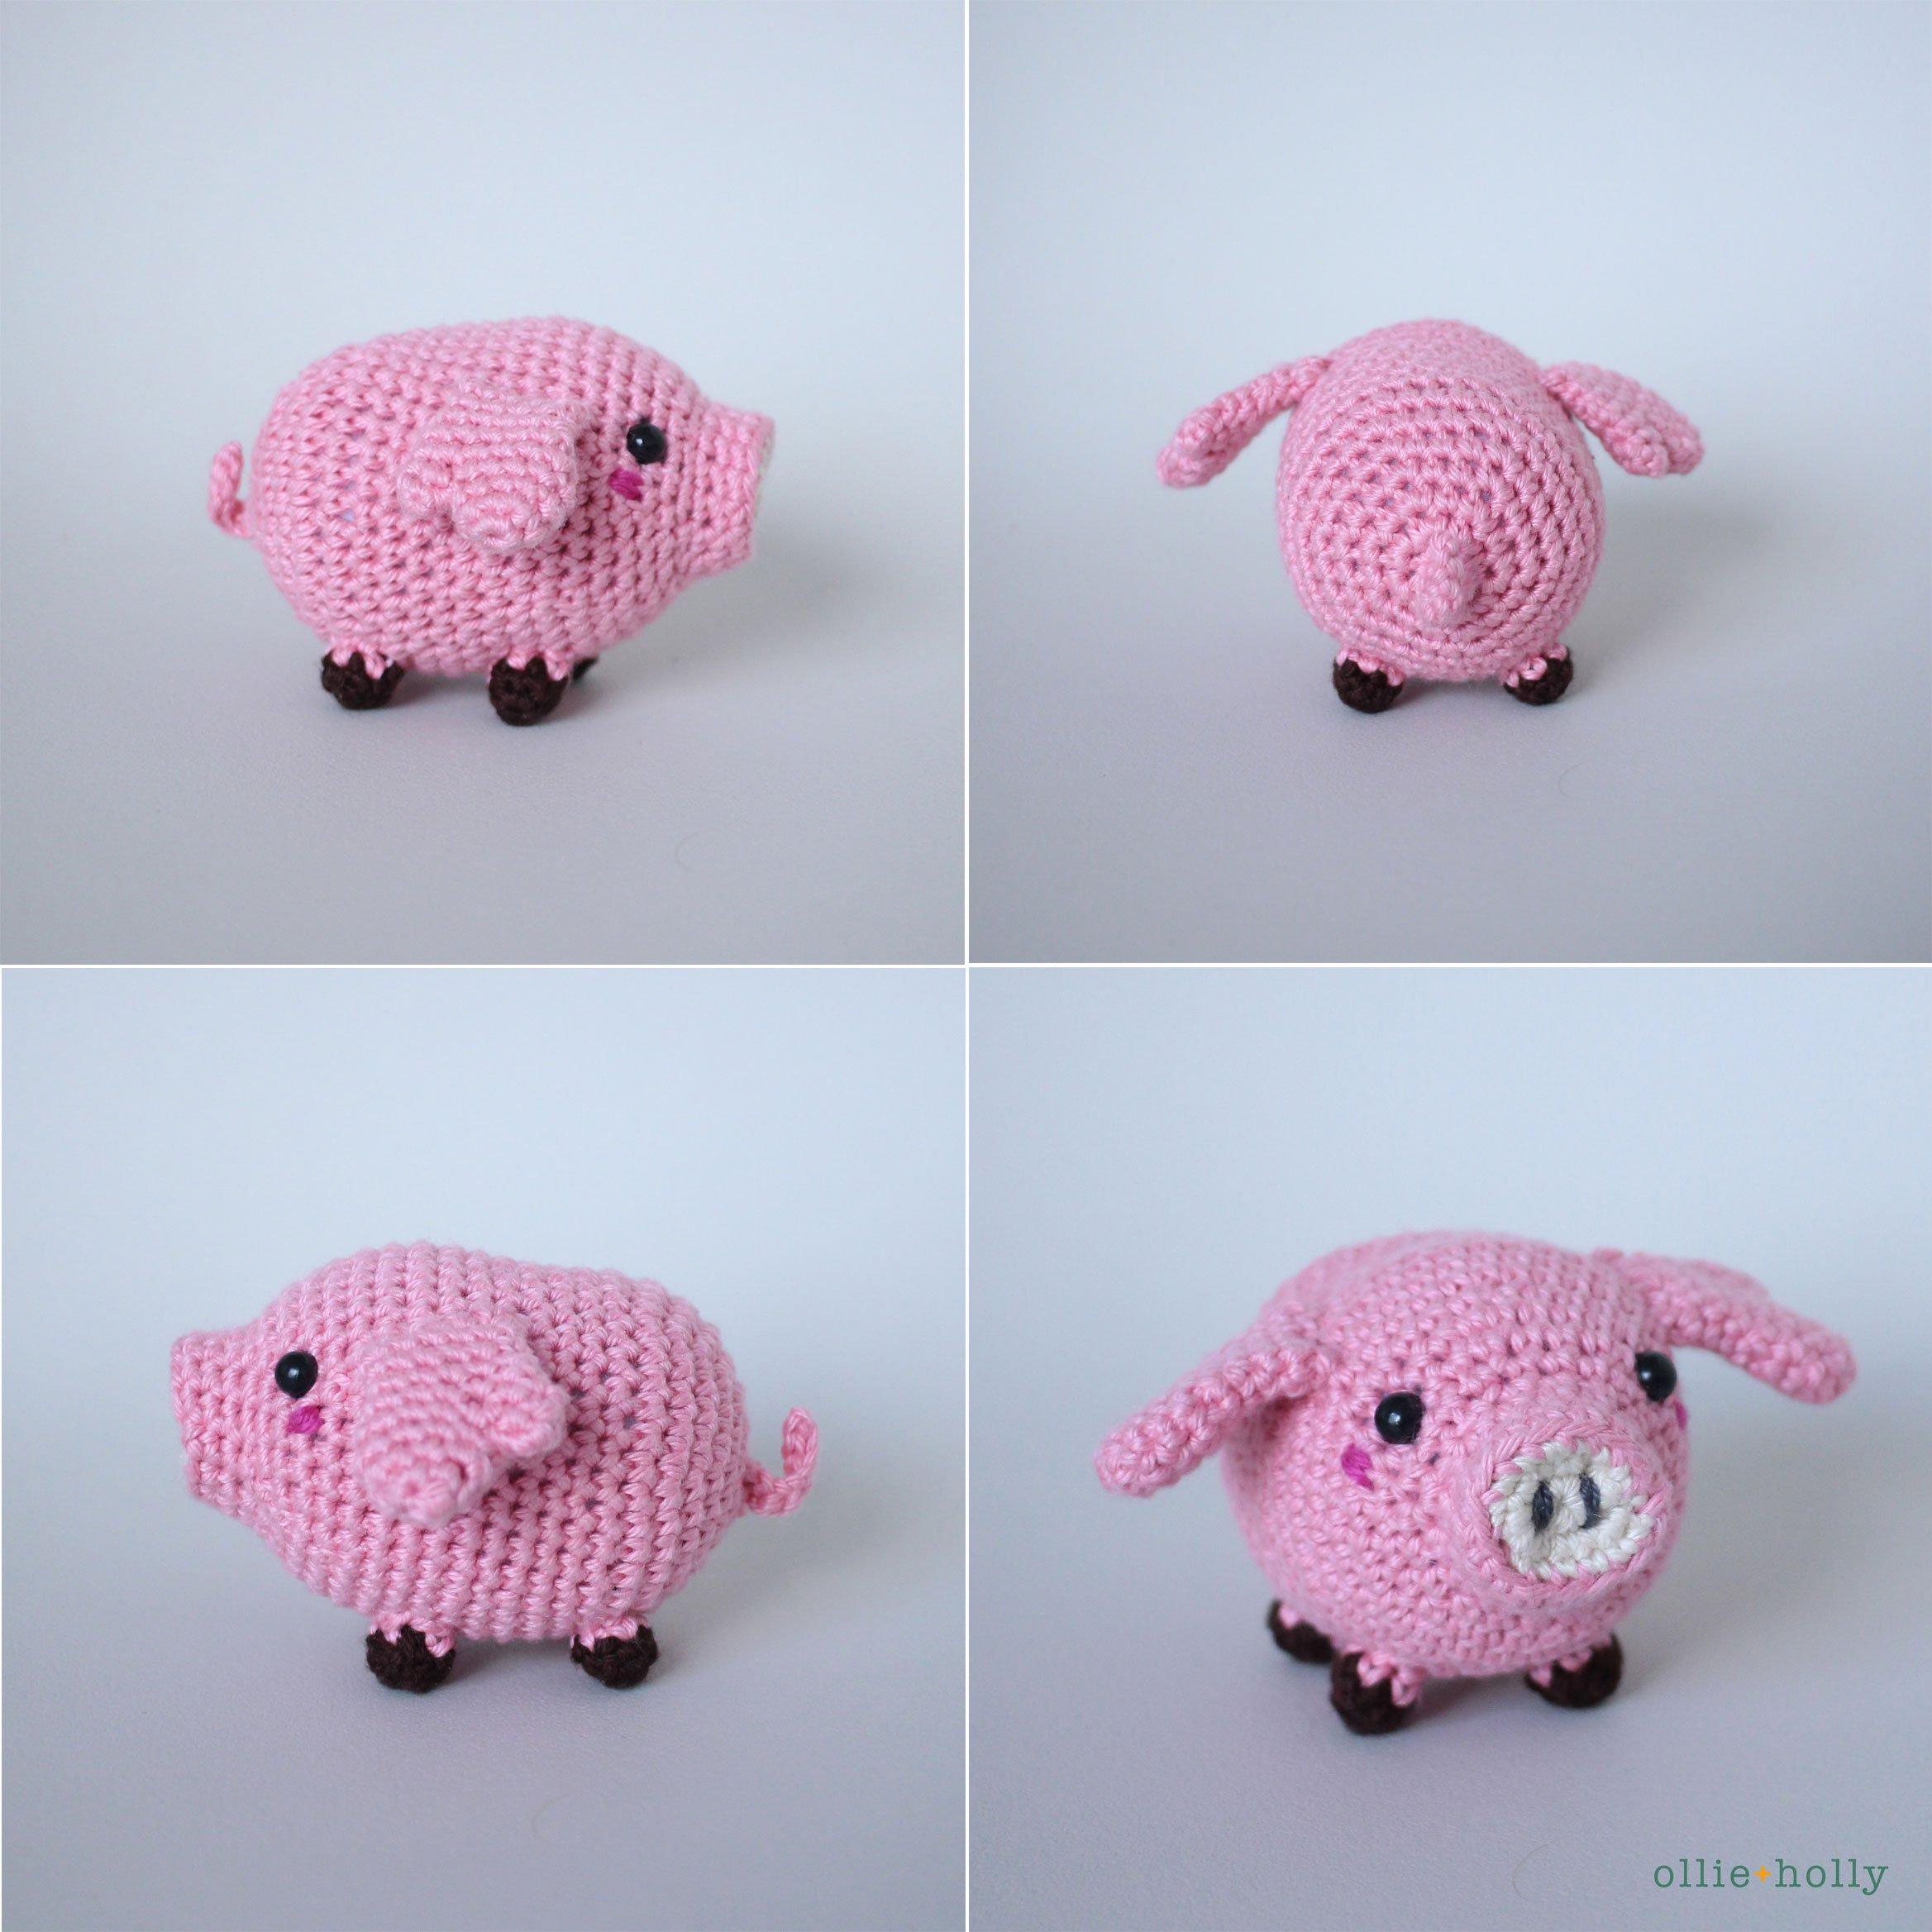 Little Piglet Crochet Amigurumi Toy | 2337x2337